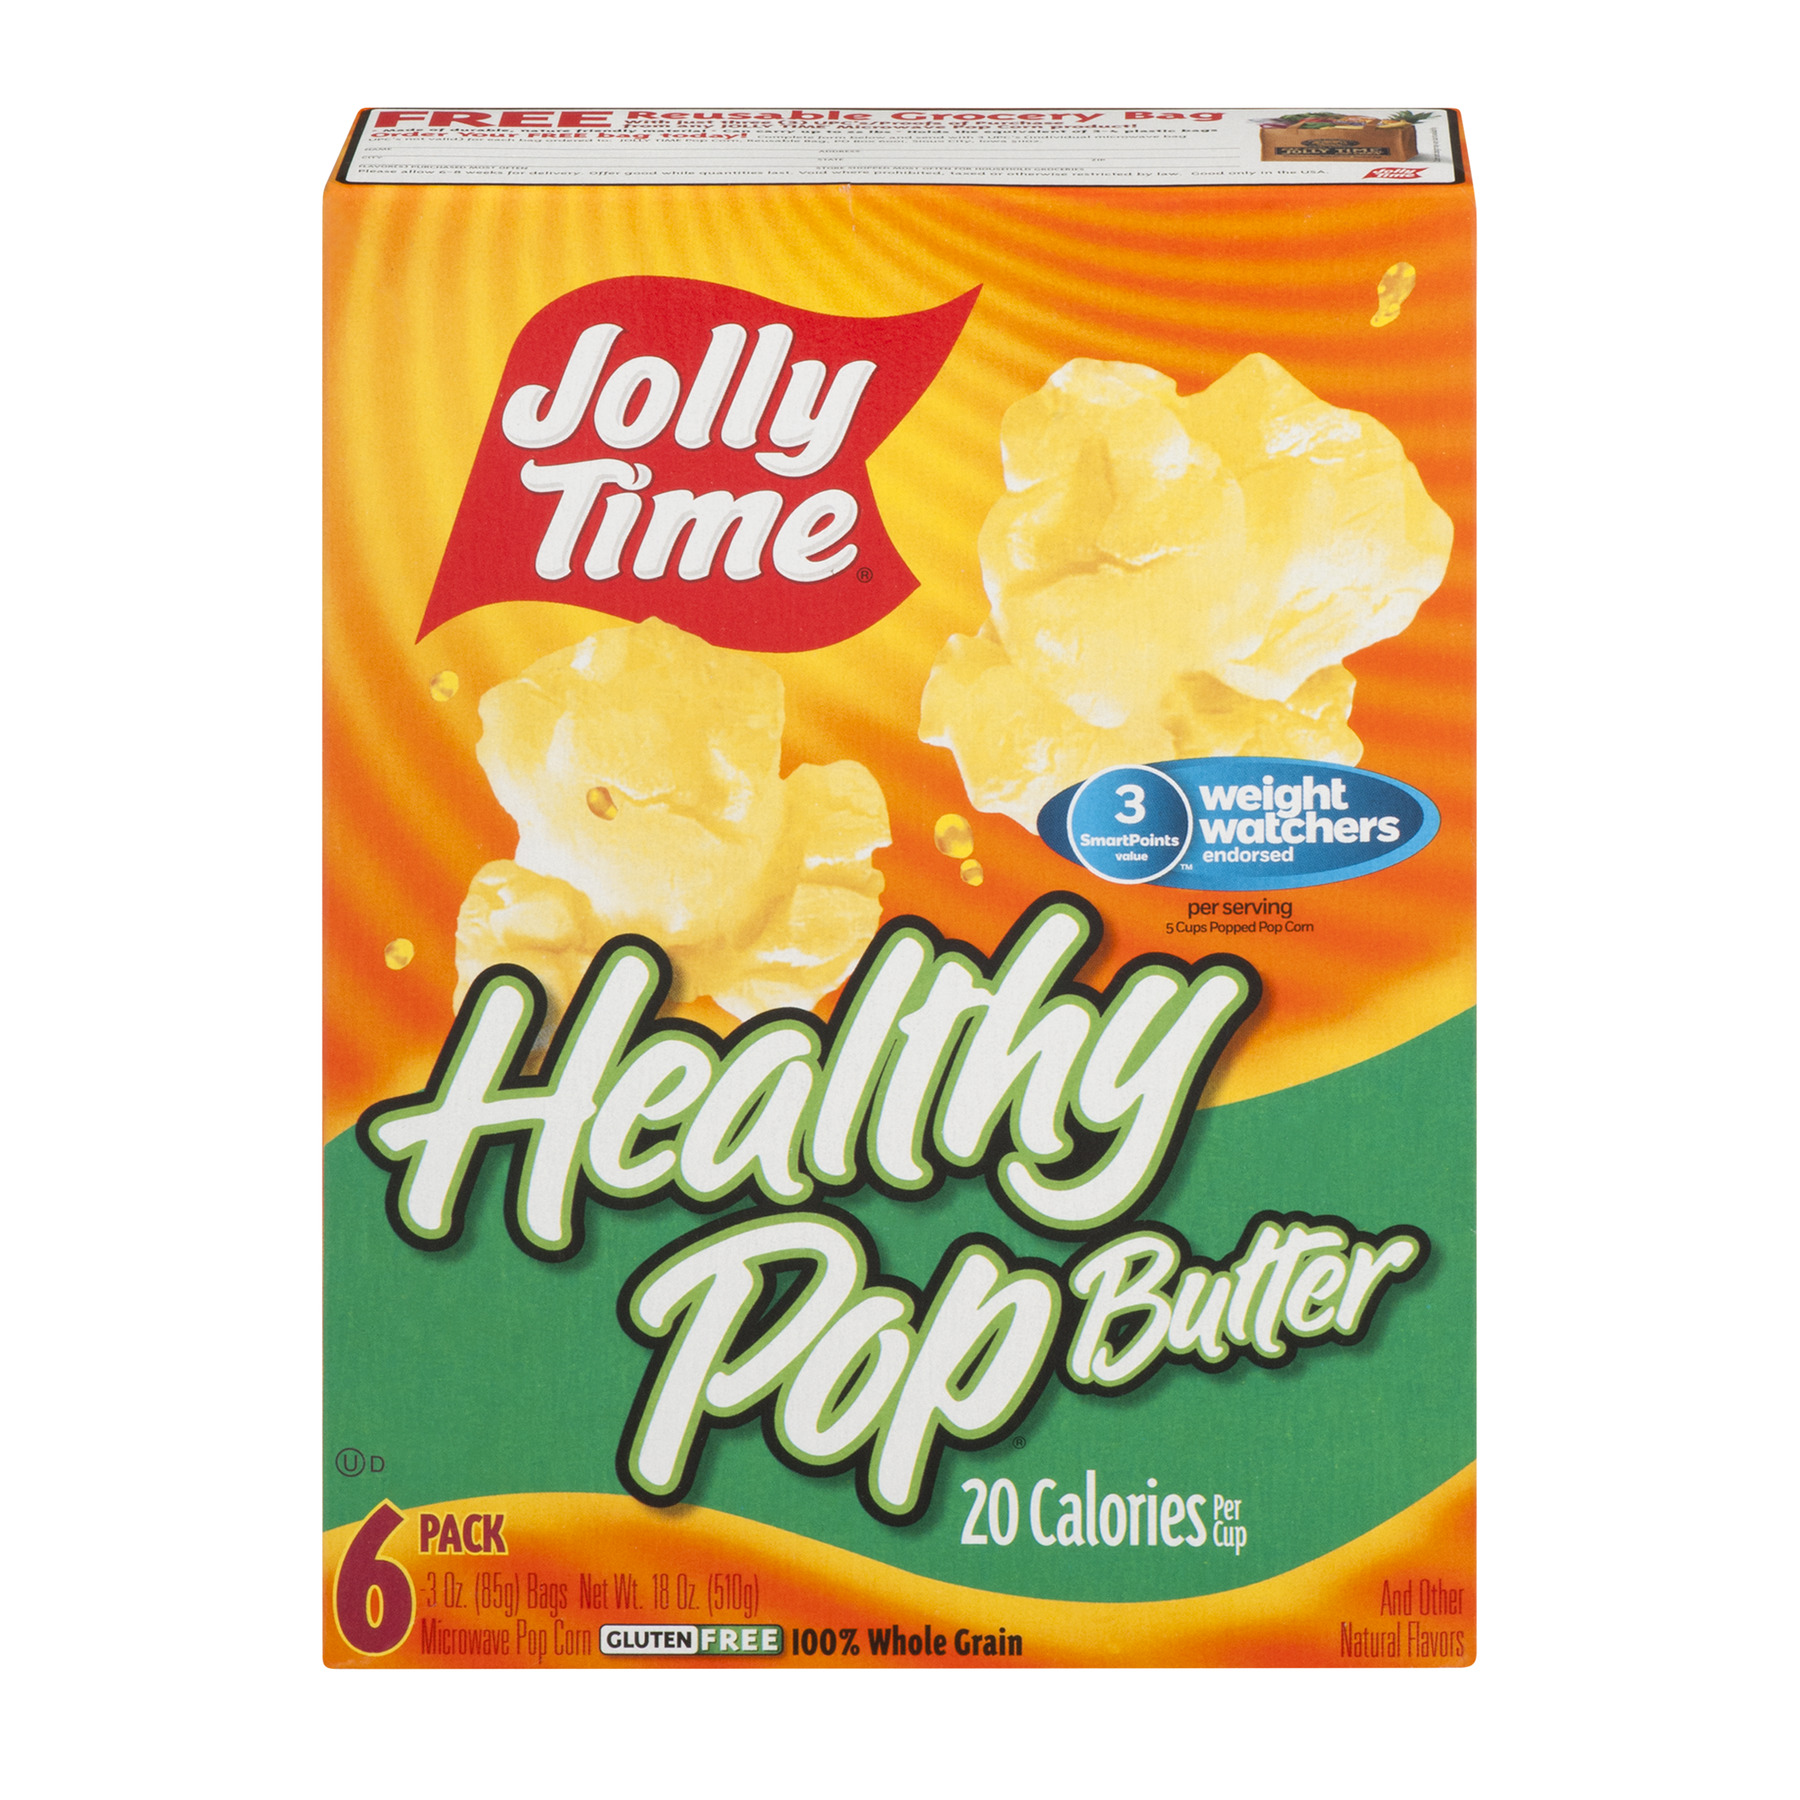 Jolly Time Healthy Pop Butter Microwave Pop Corn - 6 PK, 3.0 OZ